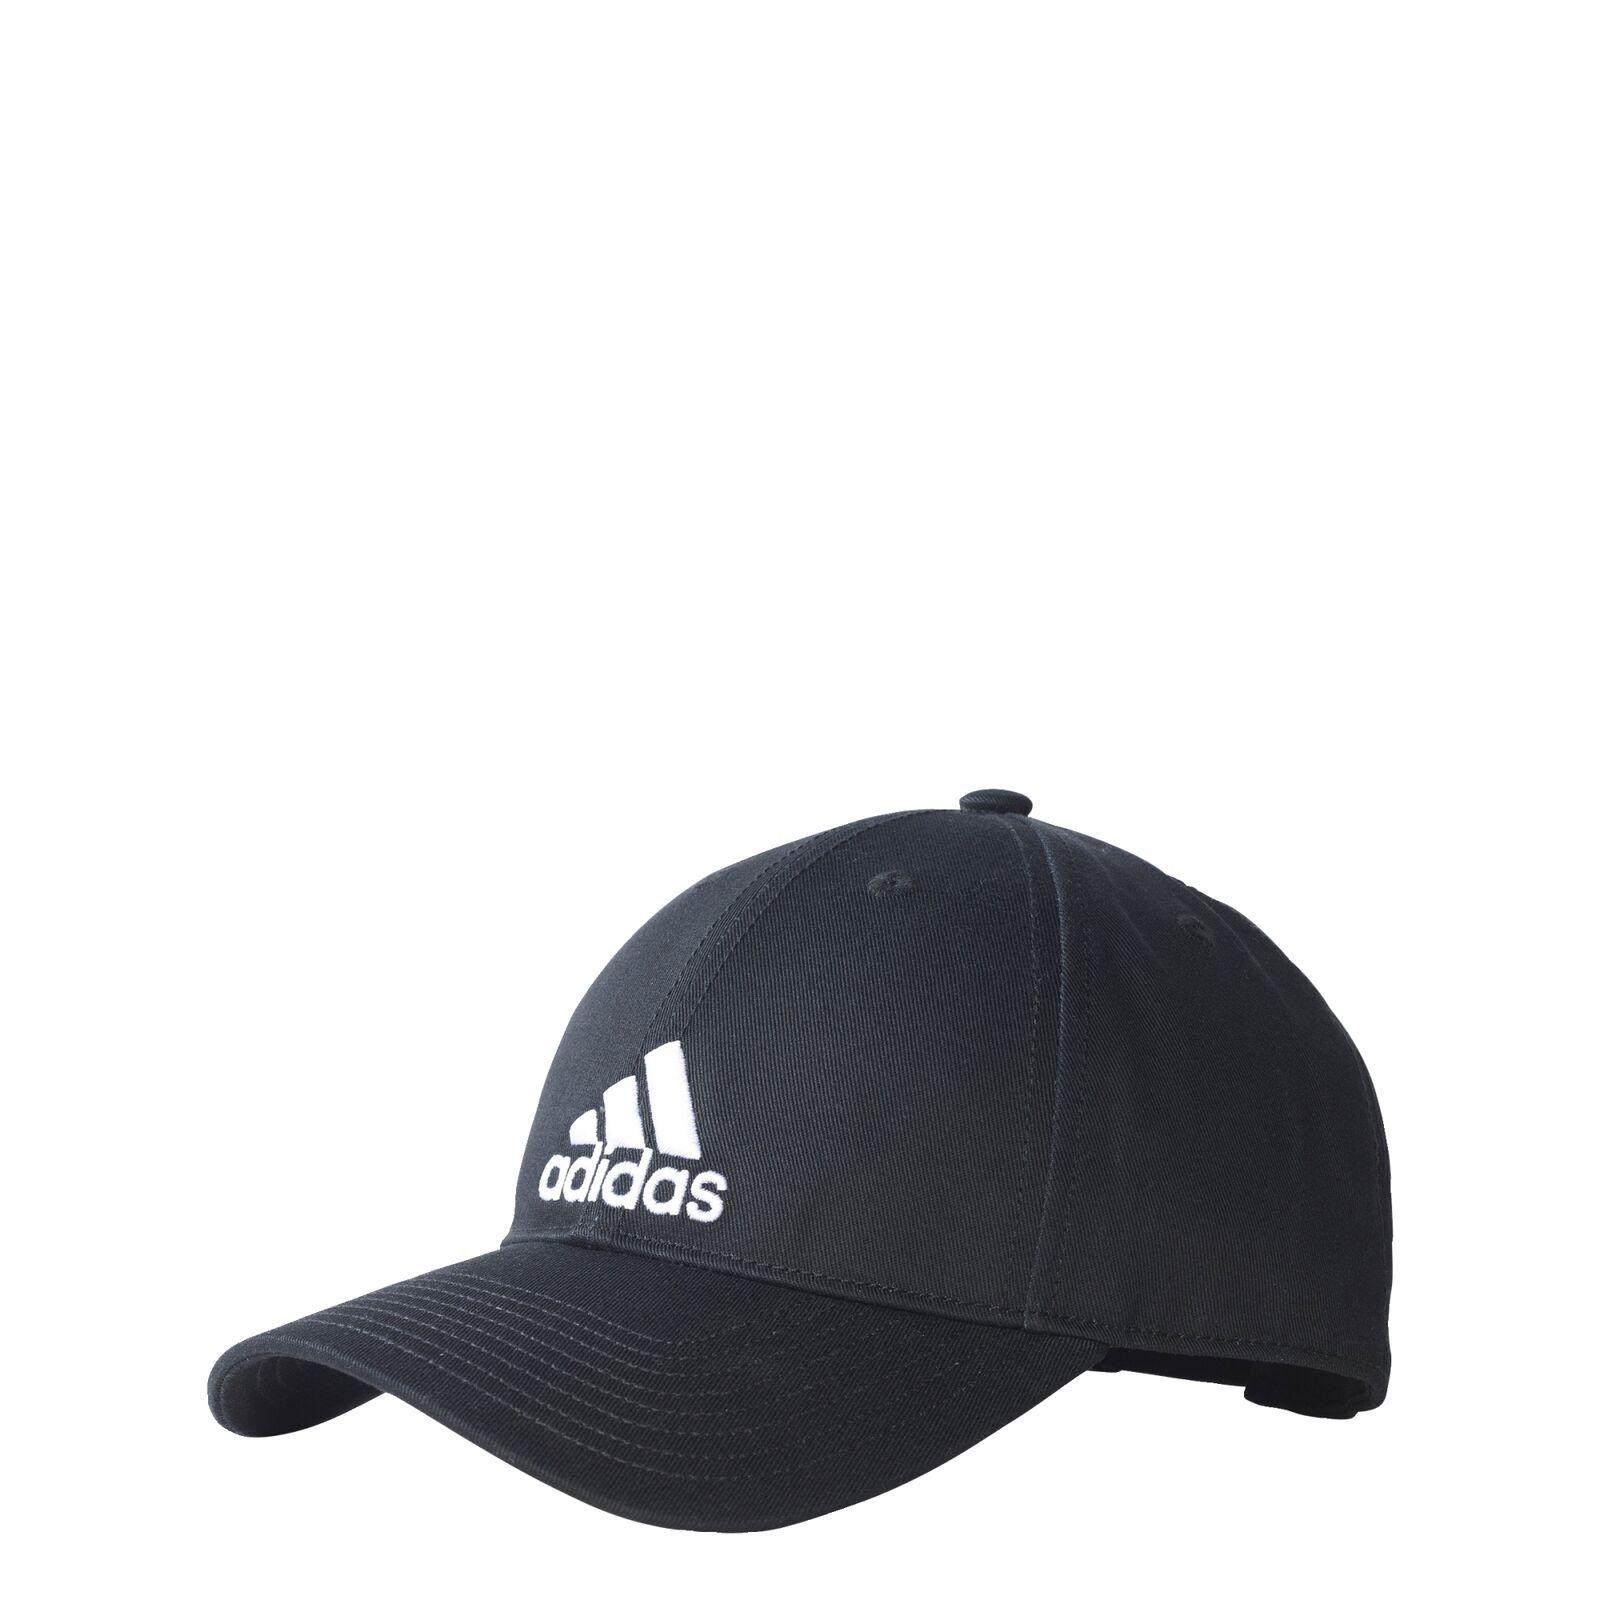 adidas Basecap 6P CAP COTTON Mütze Baseball Kappe Hut Laufmütze schwarz